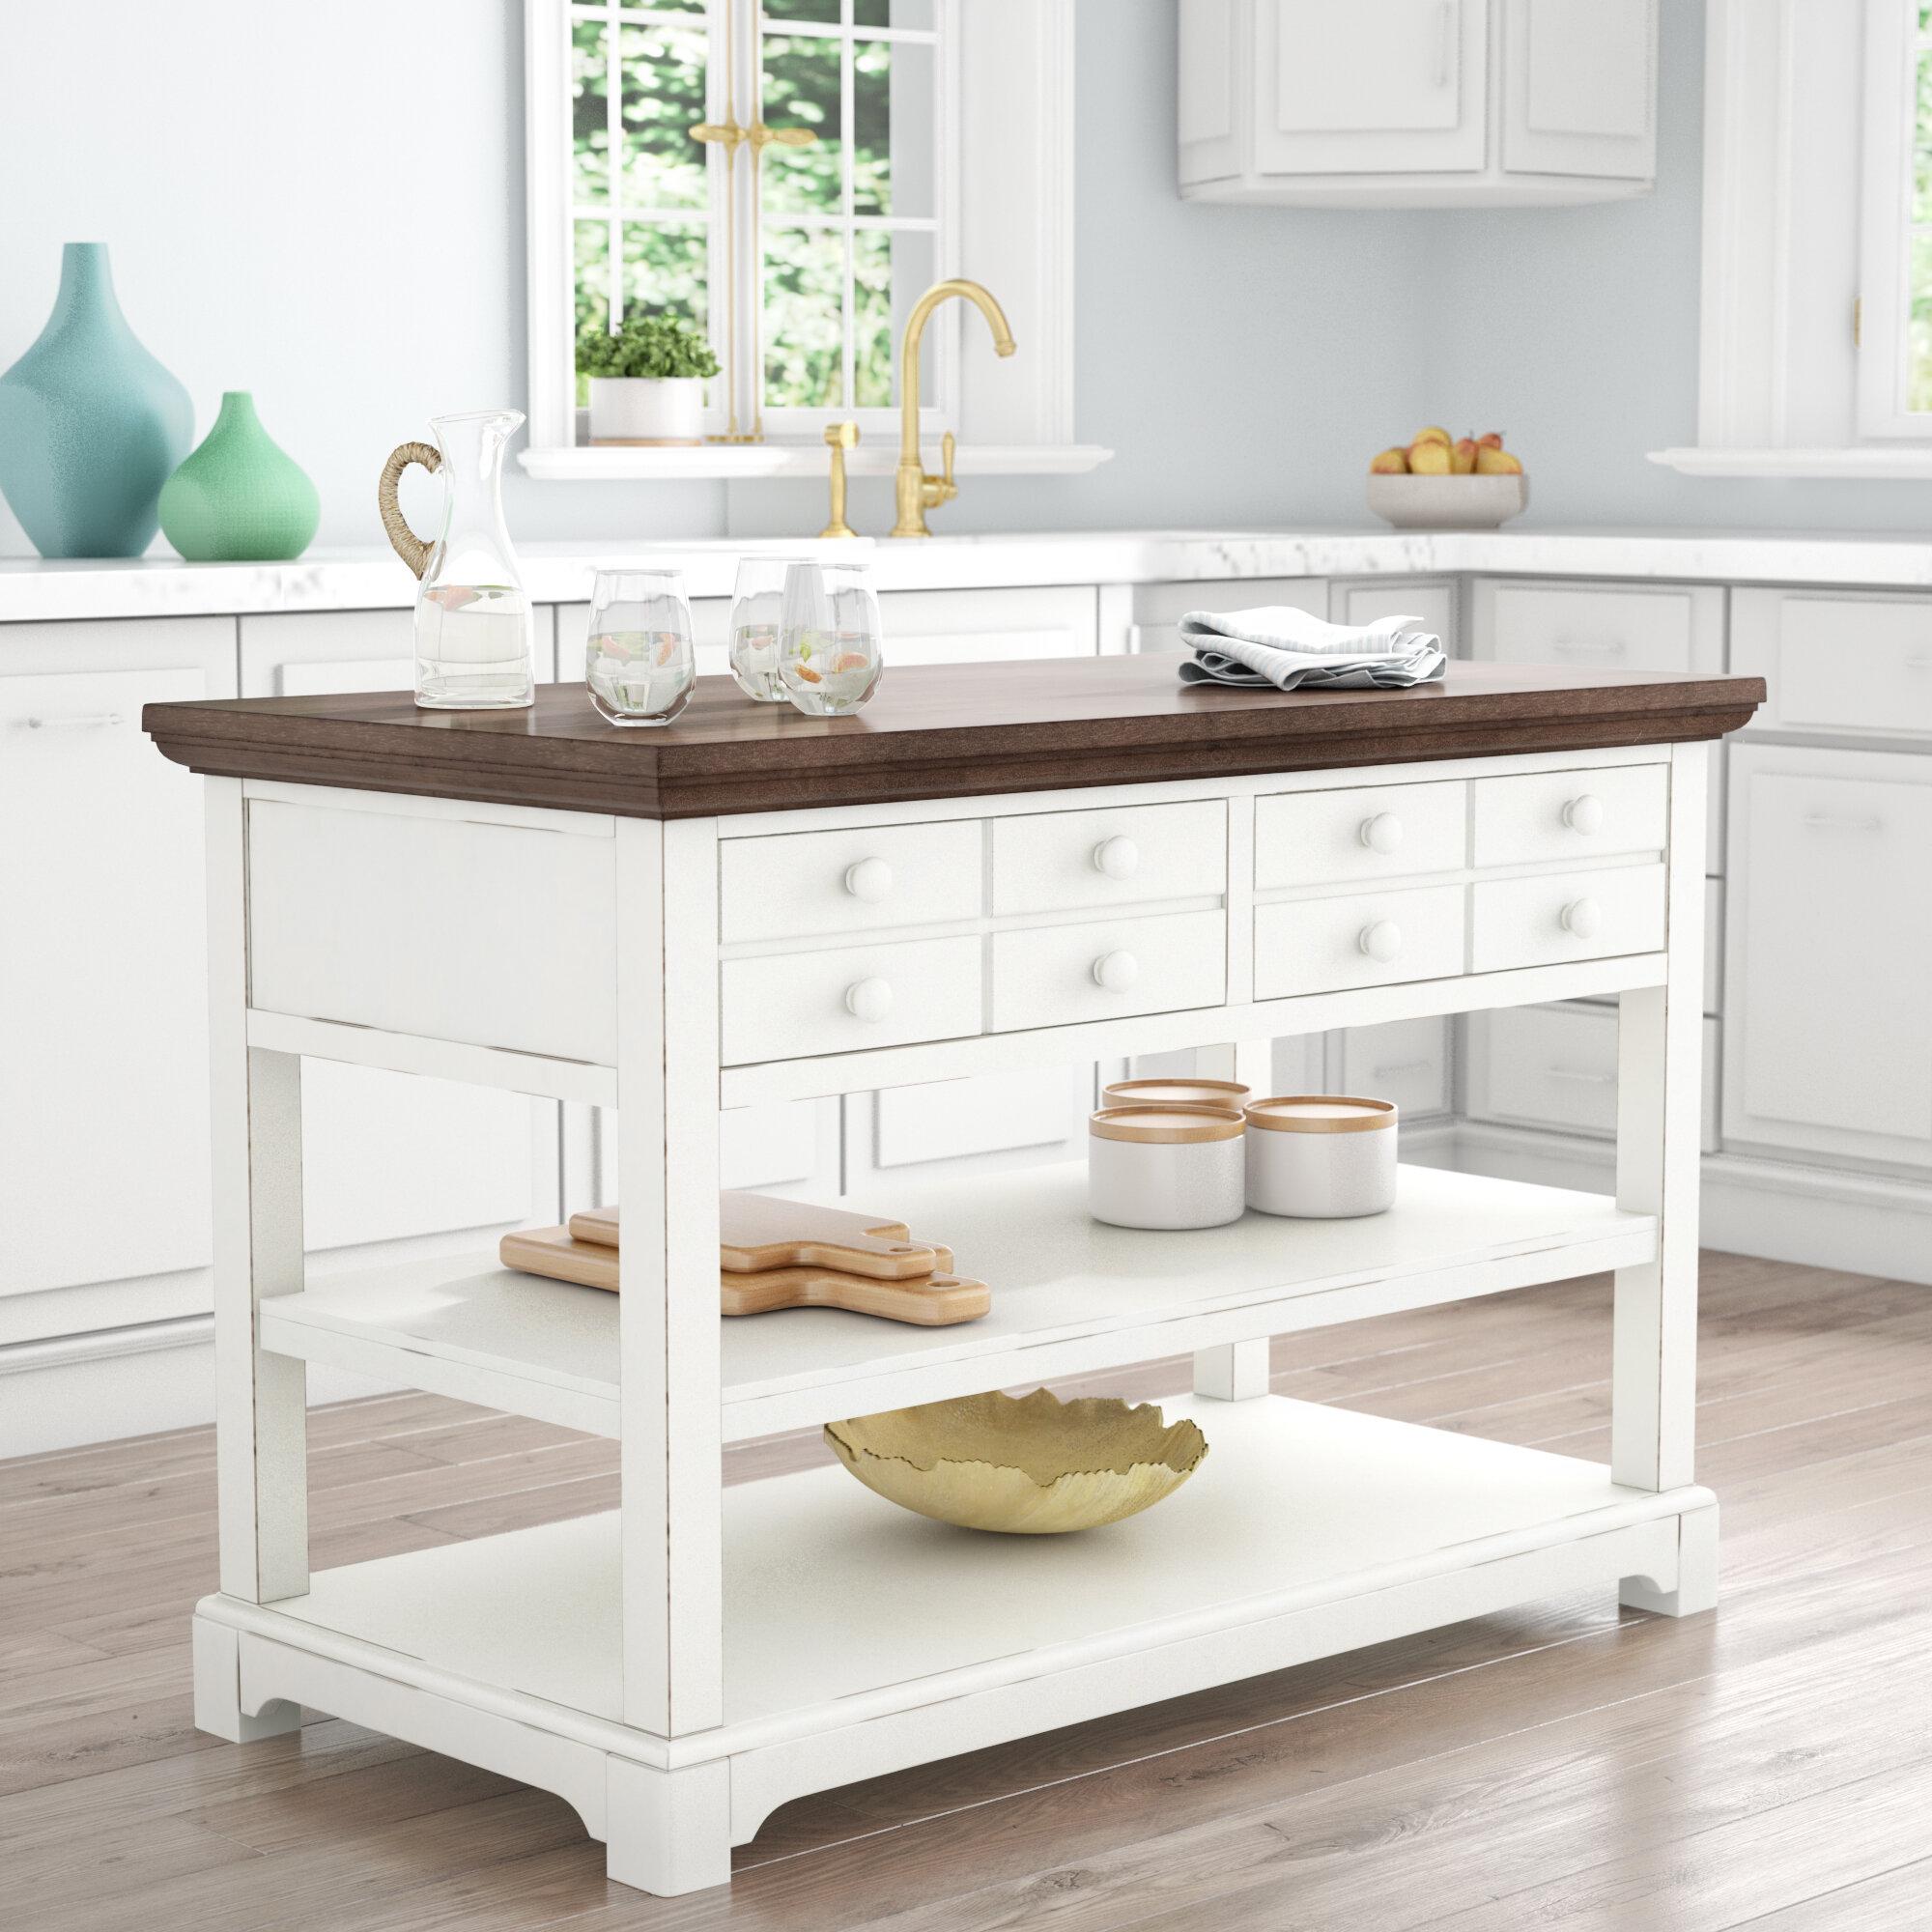 Rosecliff Heights Galliano Kitchen Island & Reviews | Wayfair